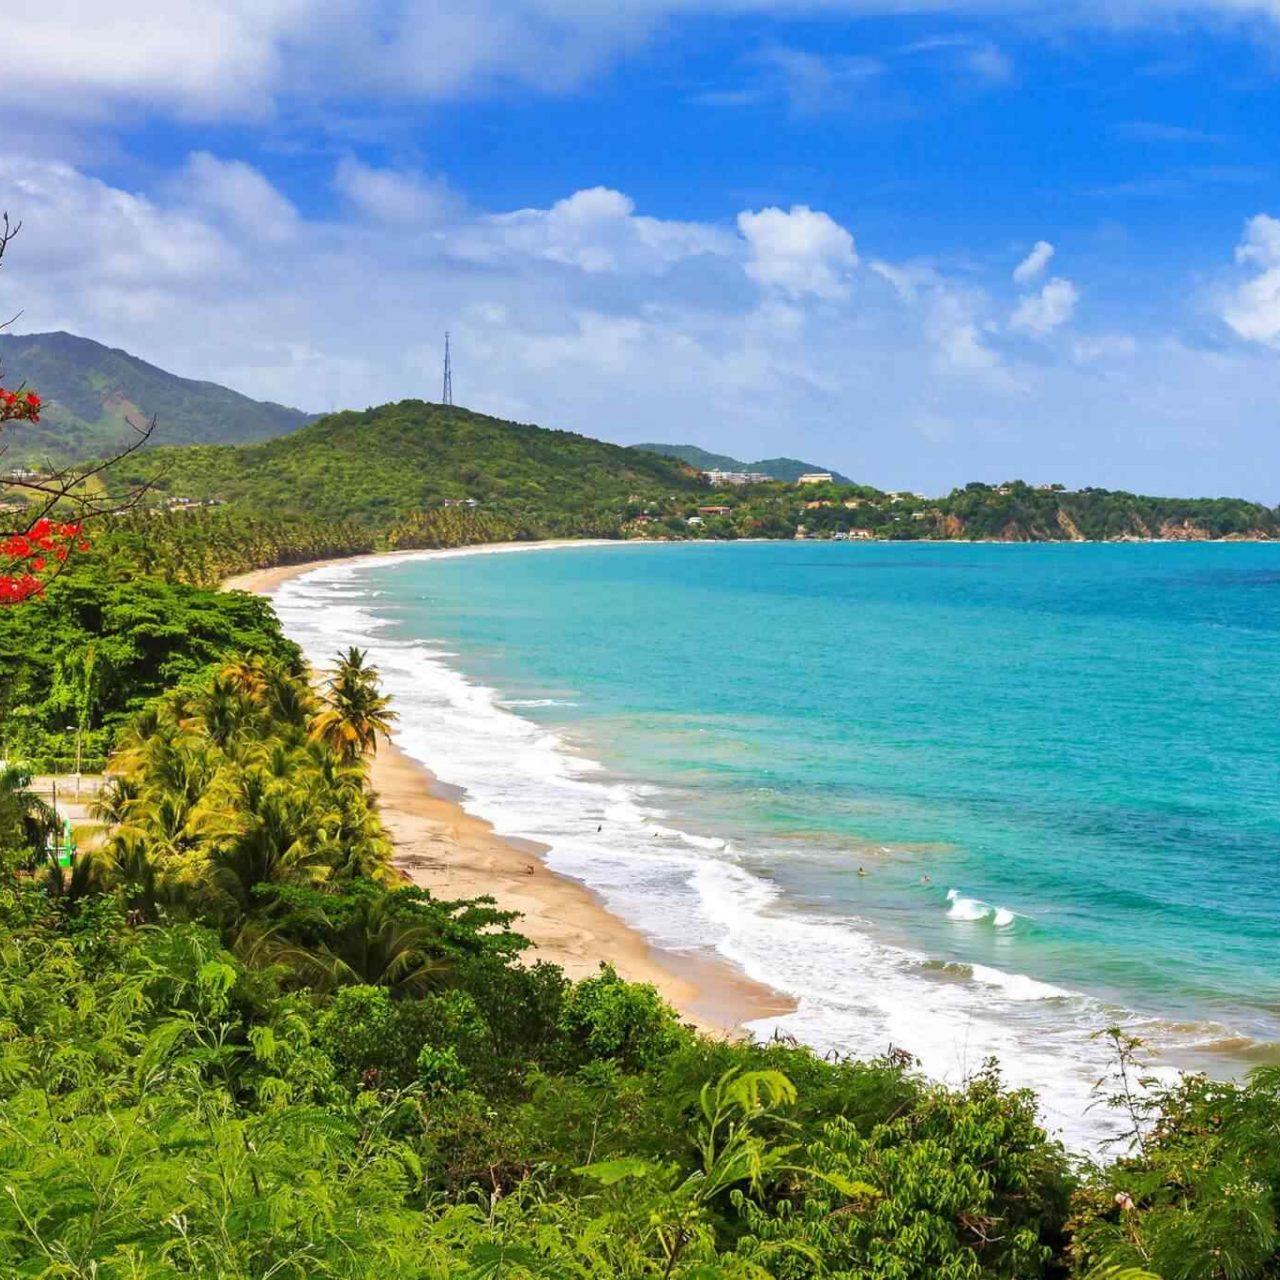 https://viveunbuenviaje.com/wp-content/uploads/2018/09/destination-puerto-rico-01-1280x1280.jpg